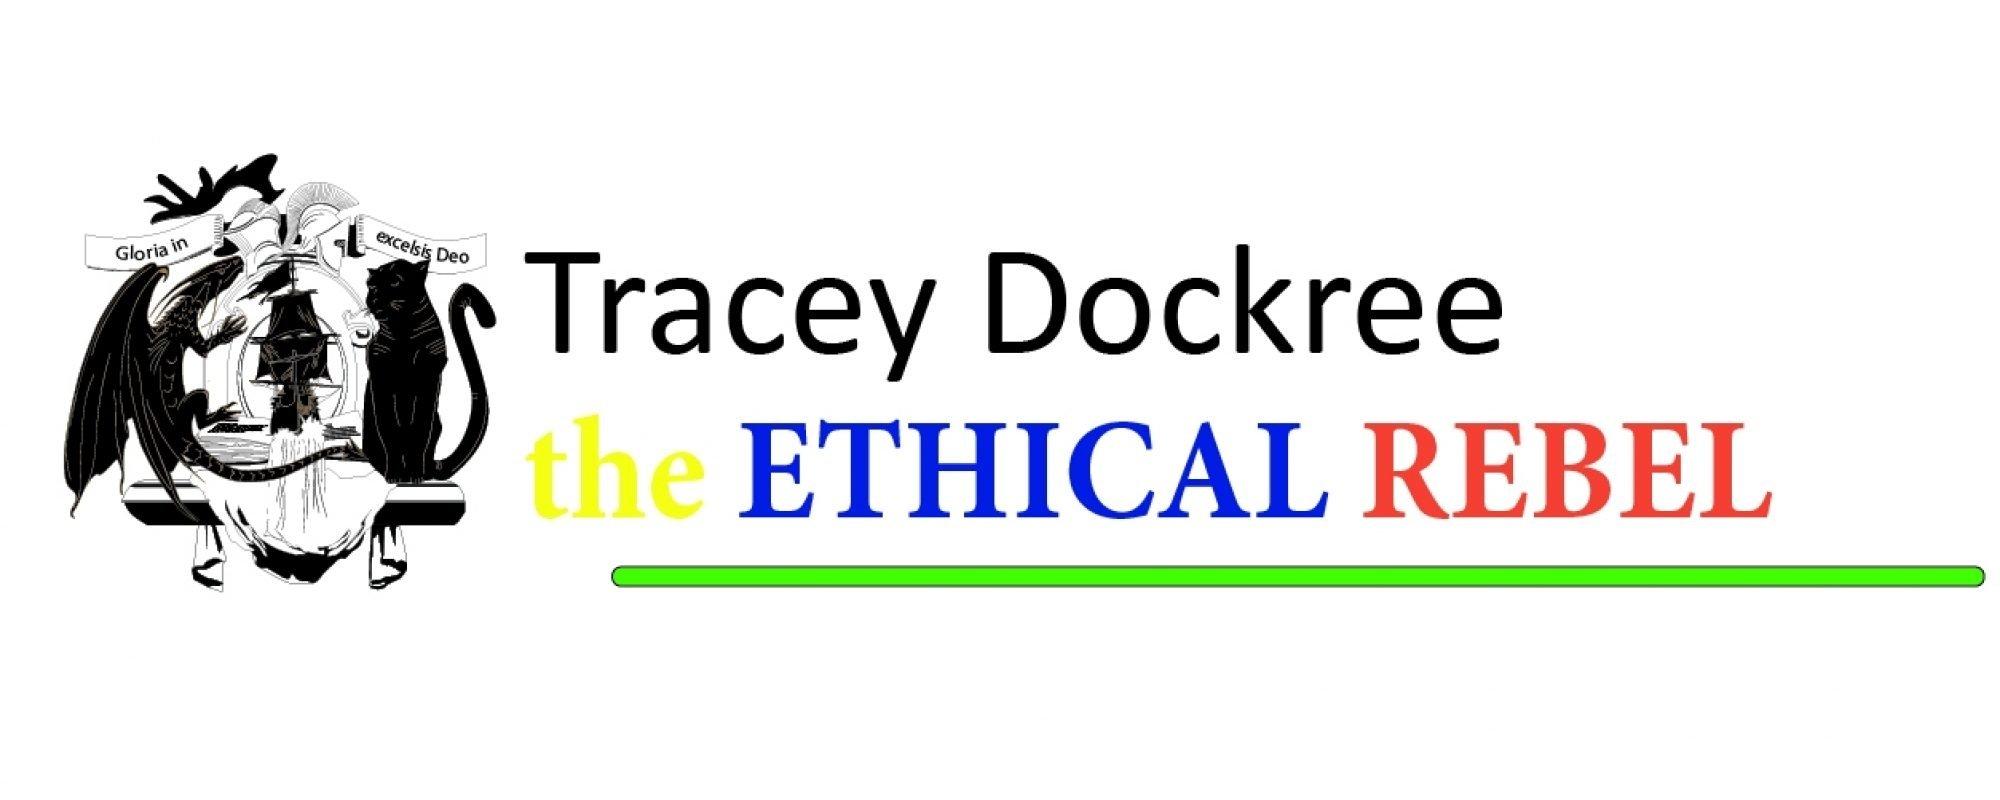 Tracey Dockree